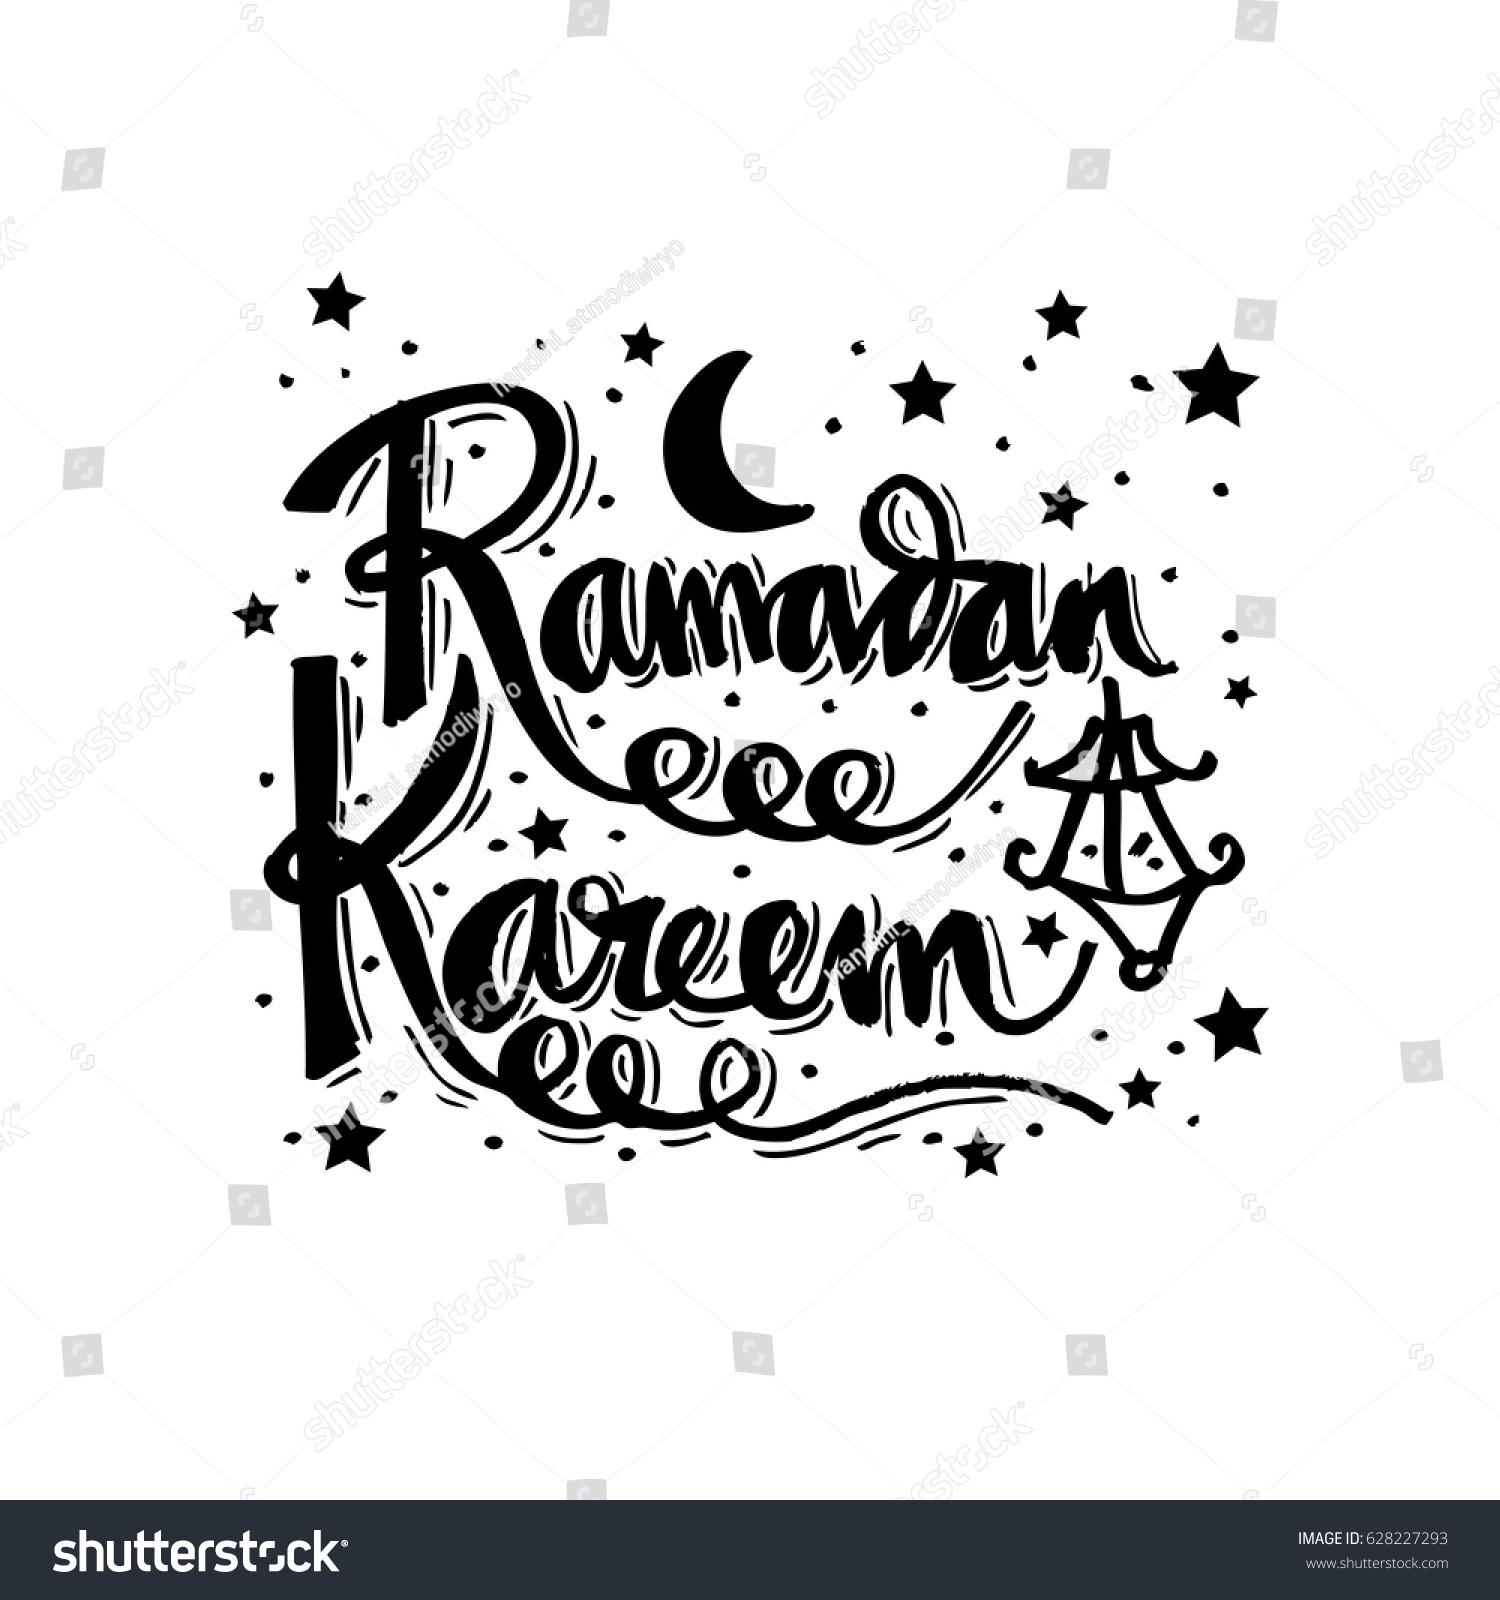 Ramadan kareem muslim holiday greetings handwritten stock vector ramadan kareem muslim holiday greetings handwritten lettering m4hsunfo